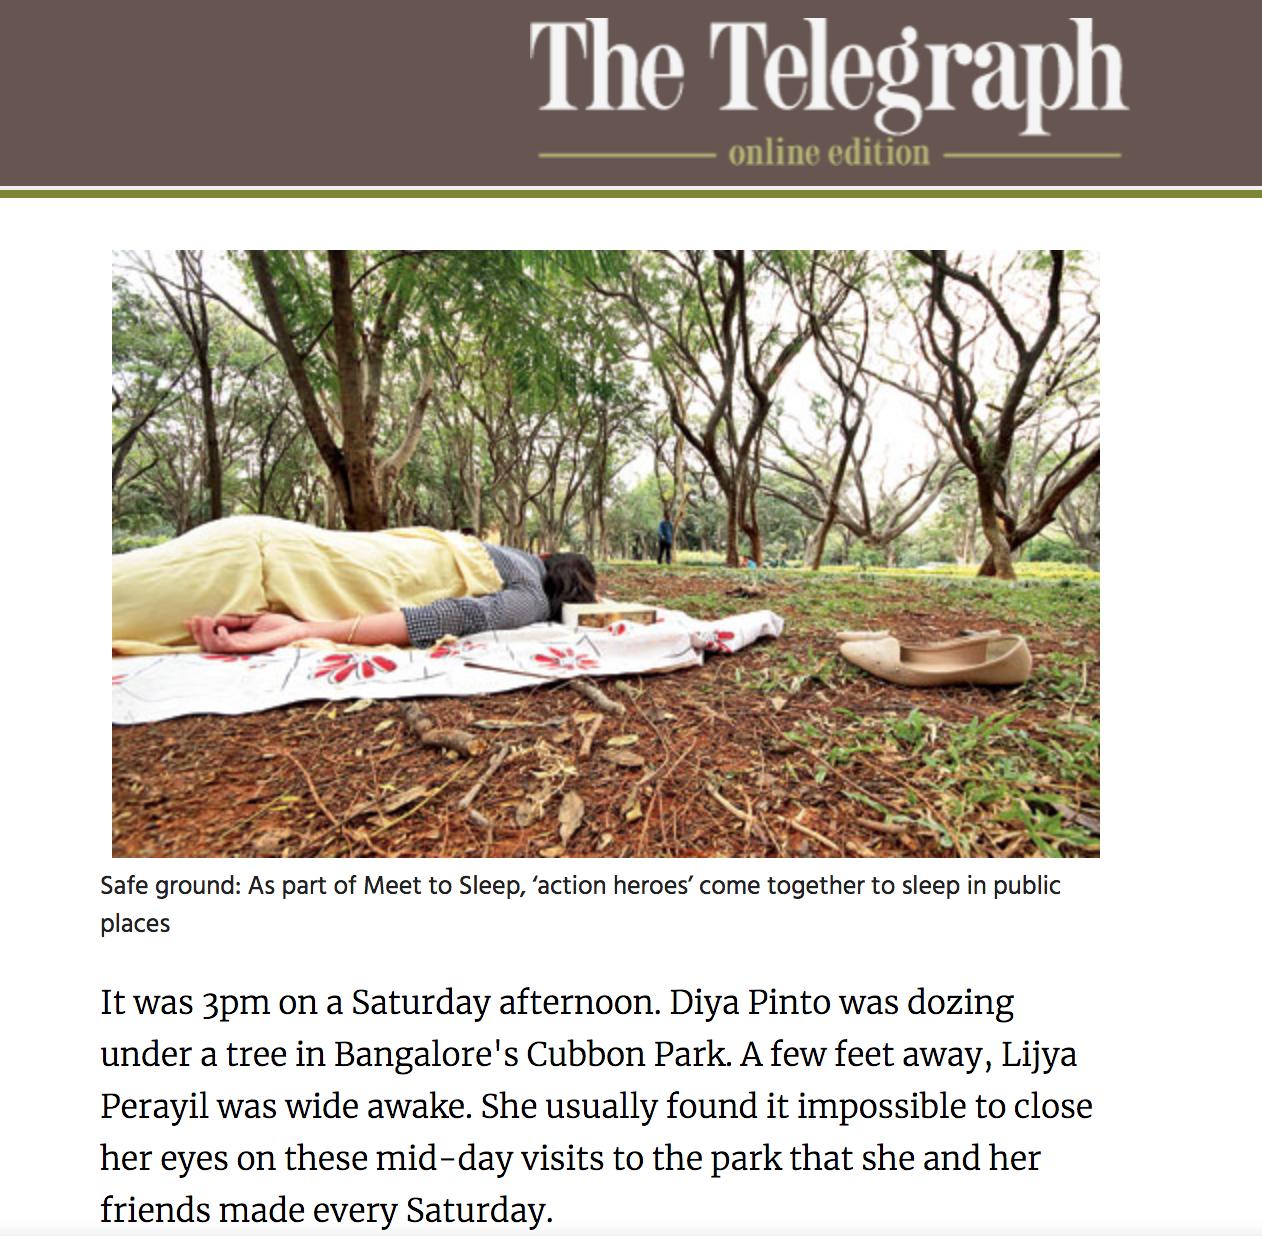 The Telegraph, 2015